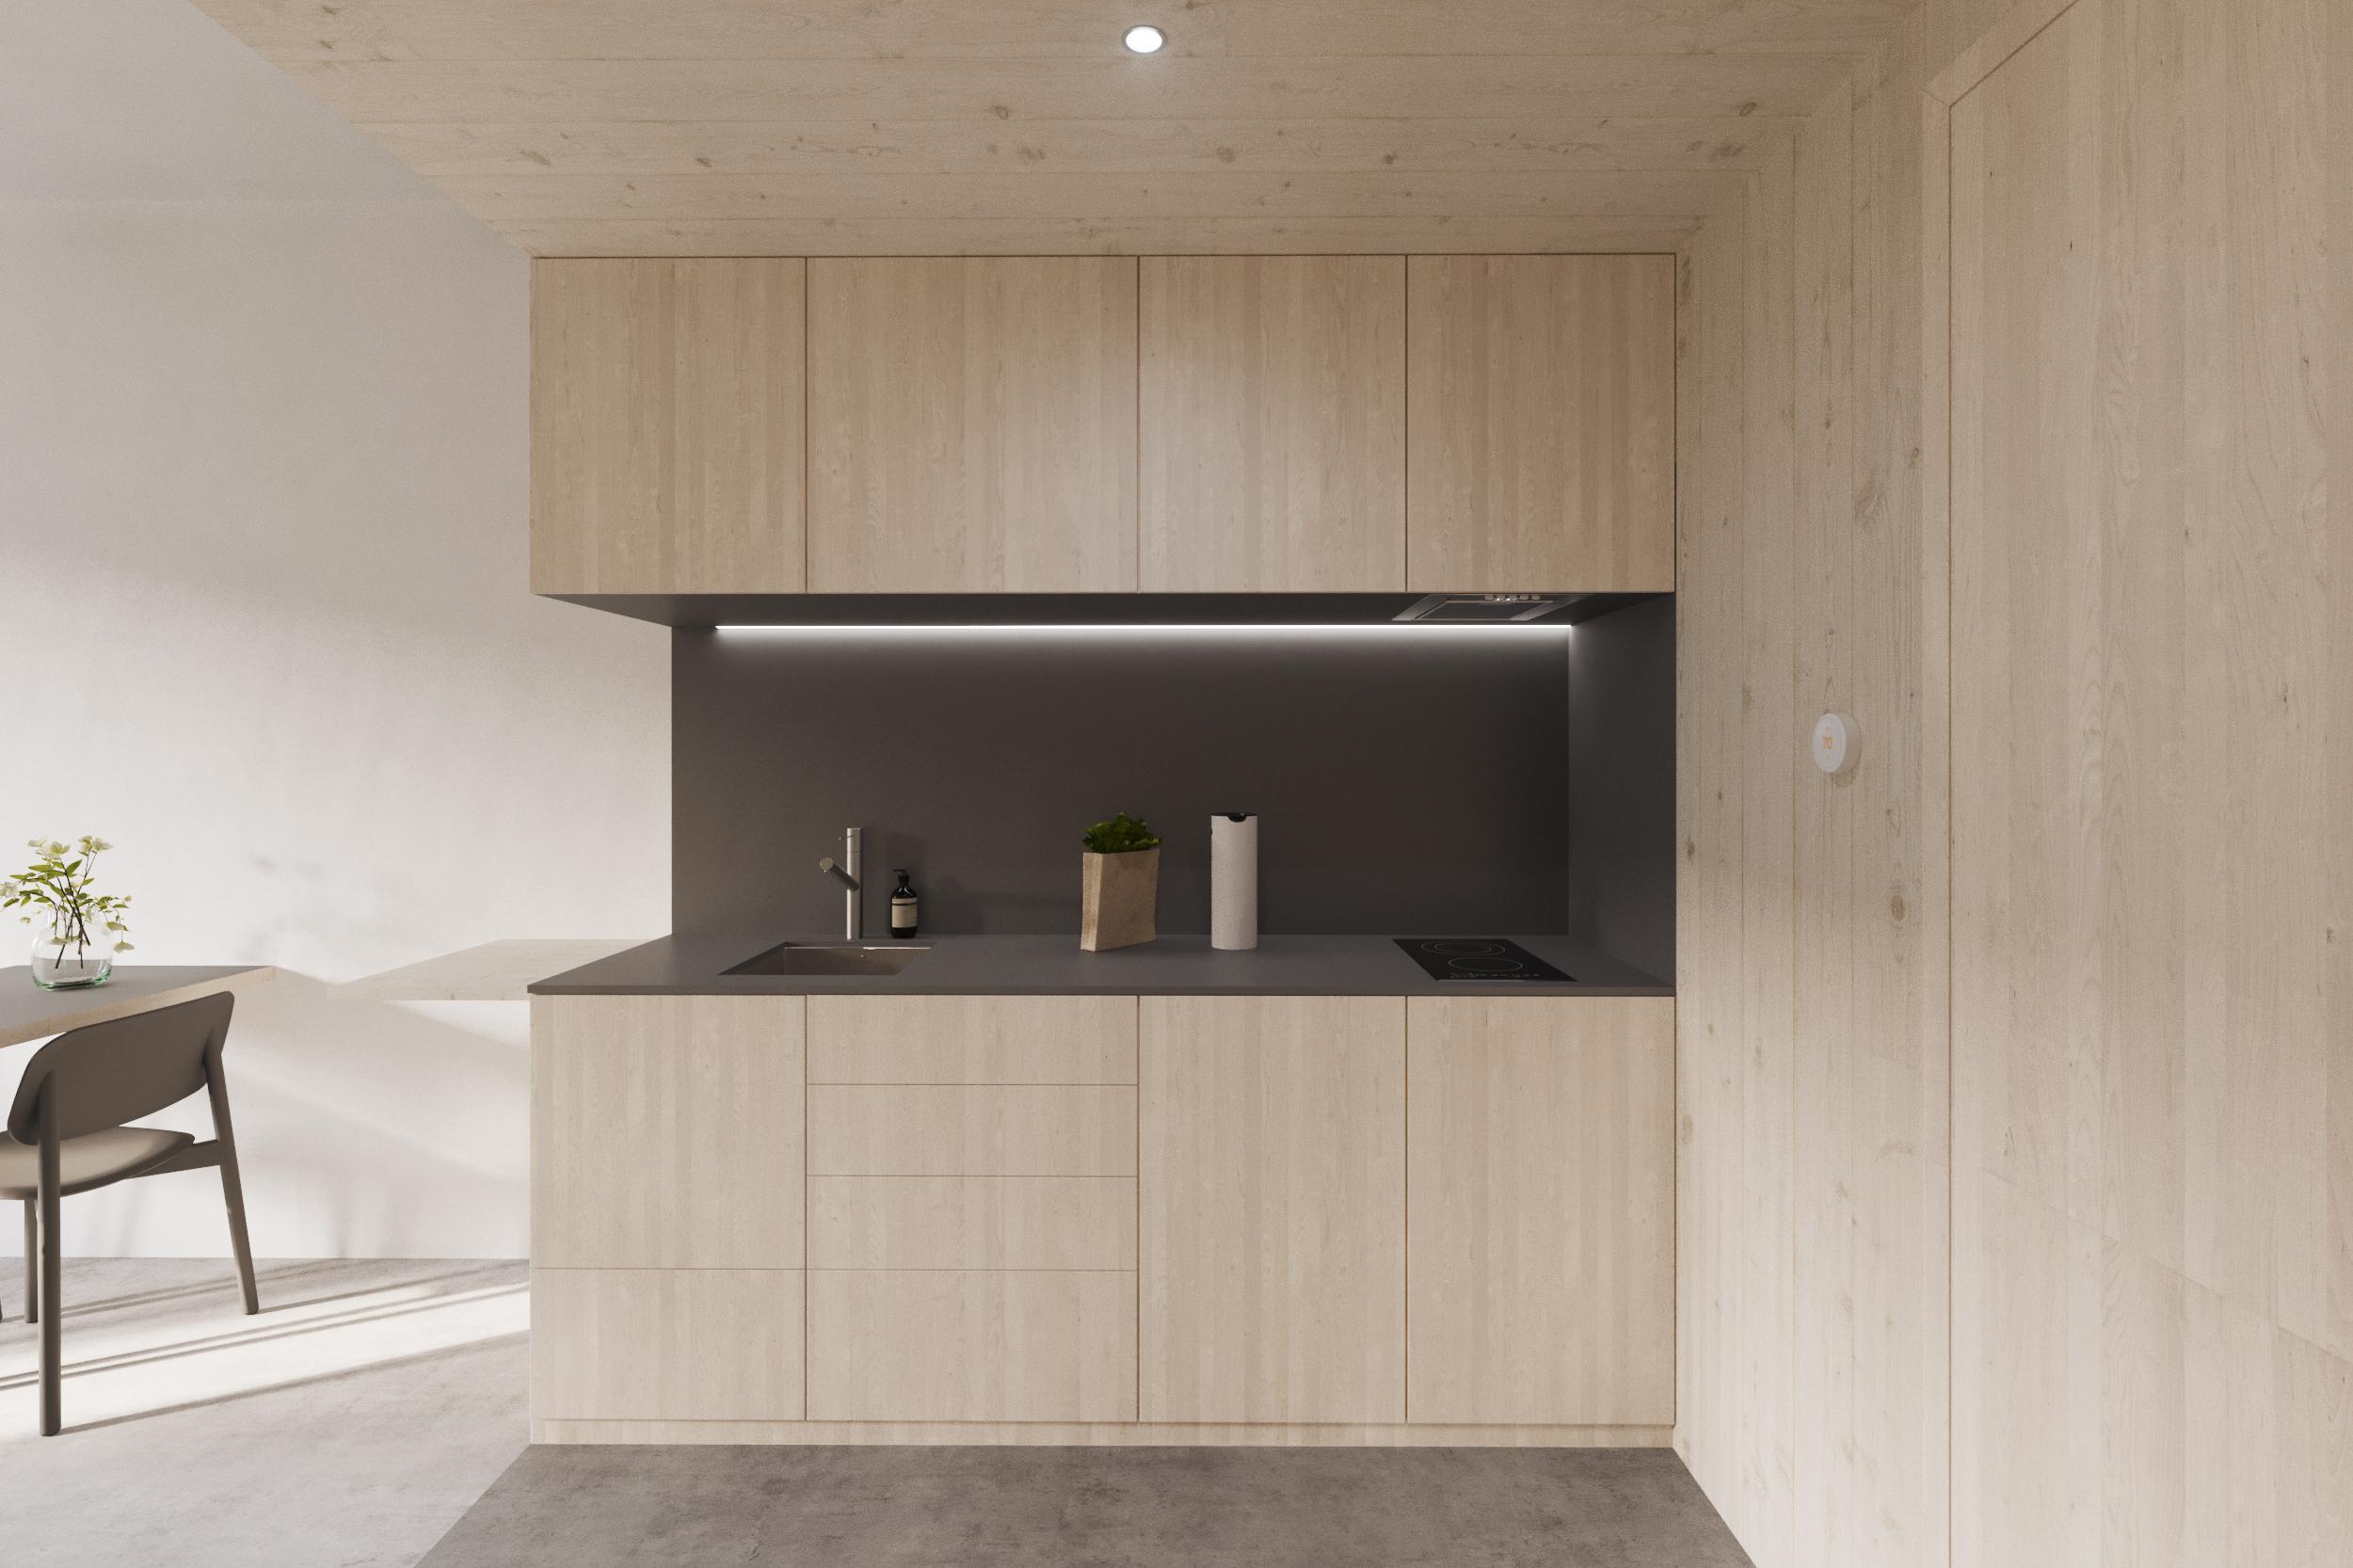 gh3 - SWL - Units - 1BR - Kitchen